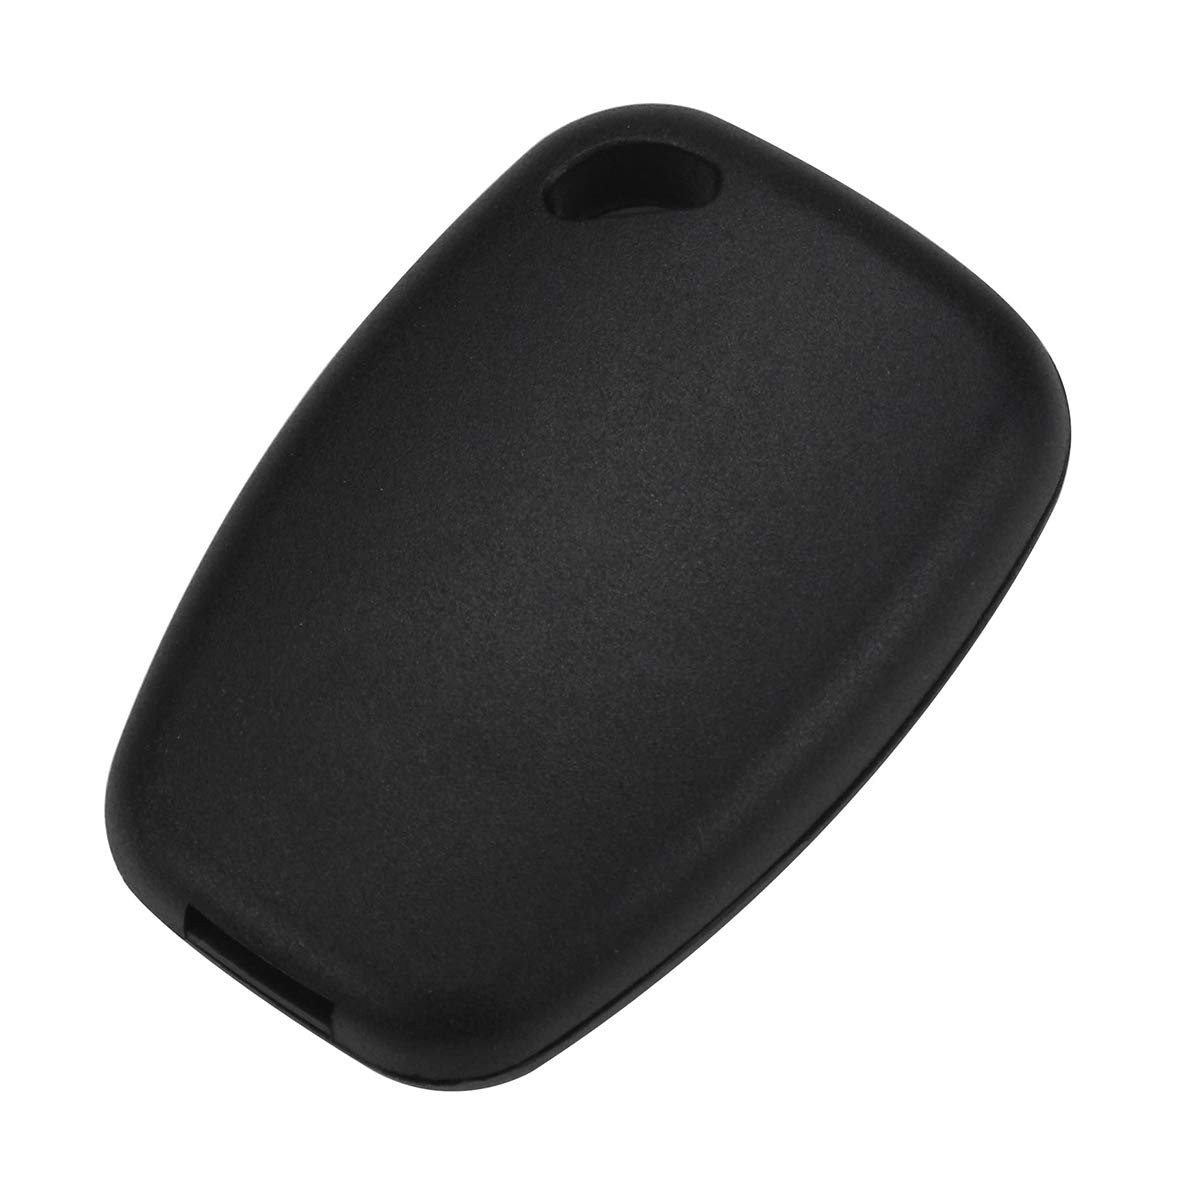 No Blade /… Heart Horse 2 PCS 2 Buttons Keyless Remote Key Case Shell Fob Compatible with Vauxhall Opel Movano Vivaro Renault Traffic Kangoo Nissan Primastar